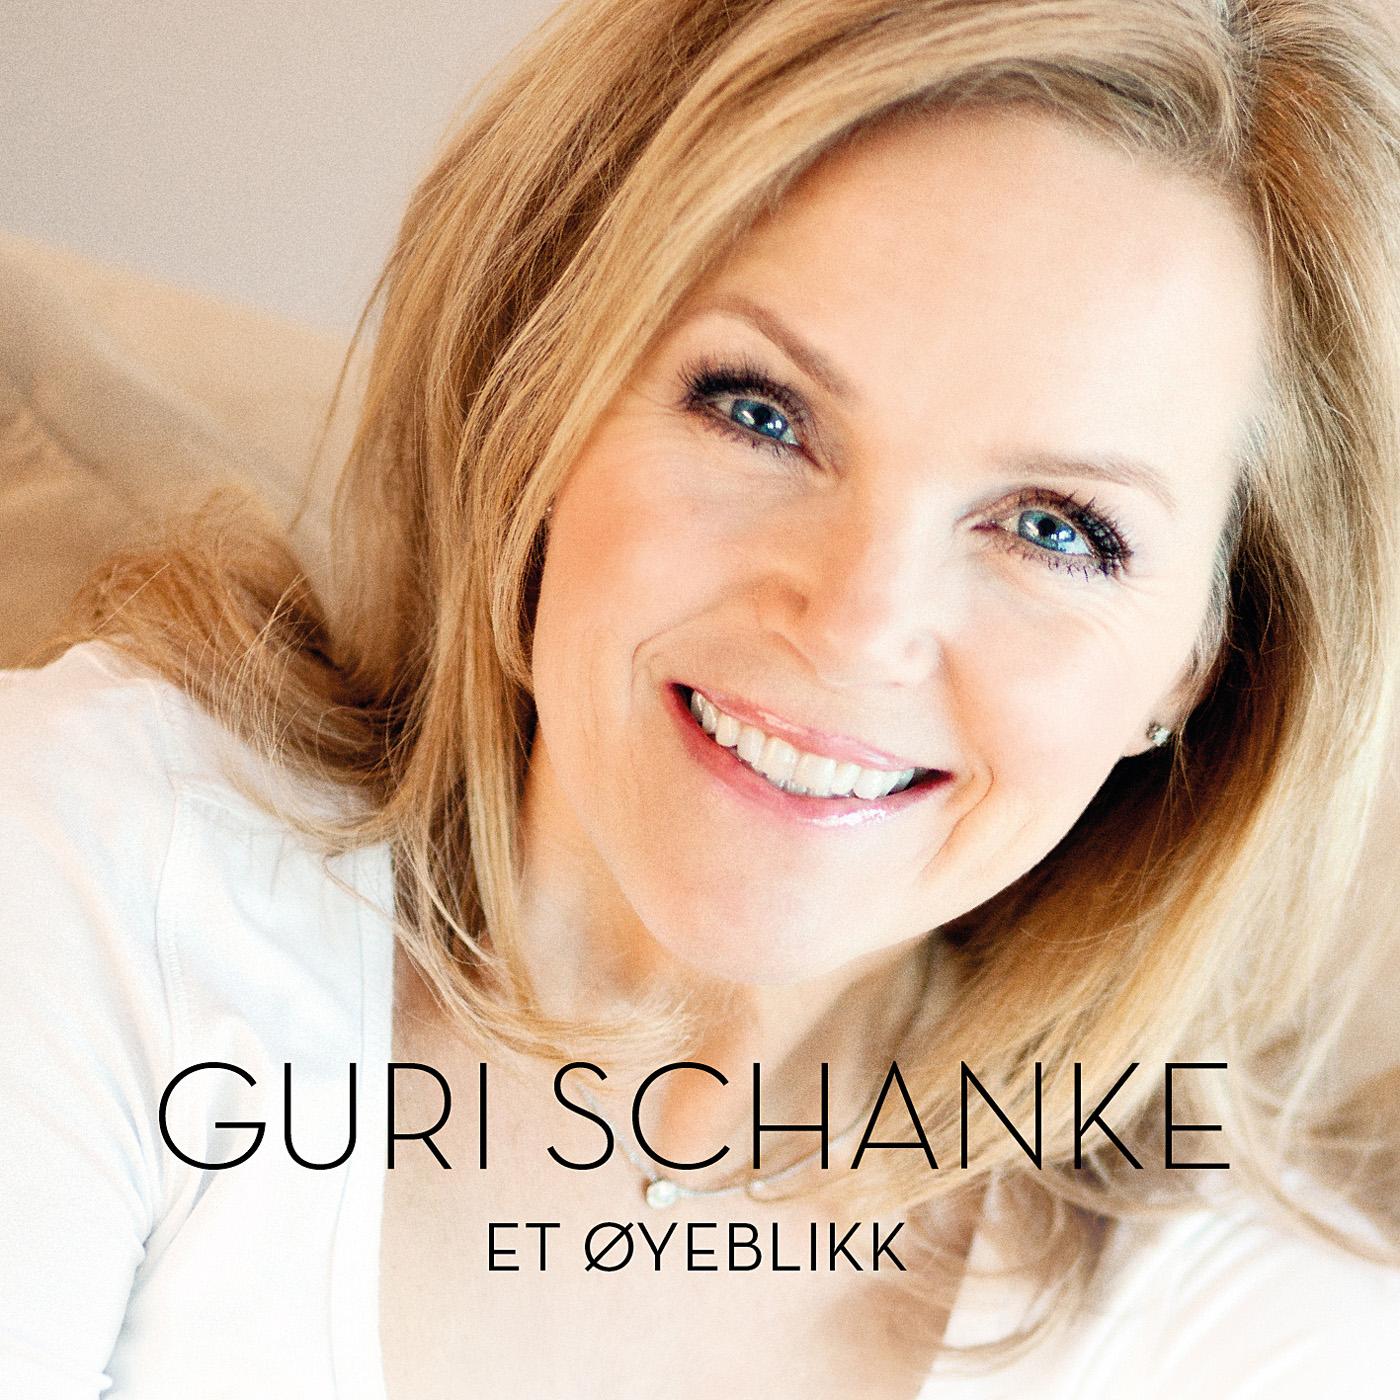 Schanke_singel_oyeblikk_2400x2400